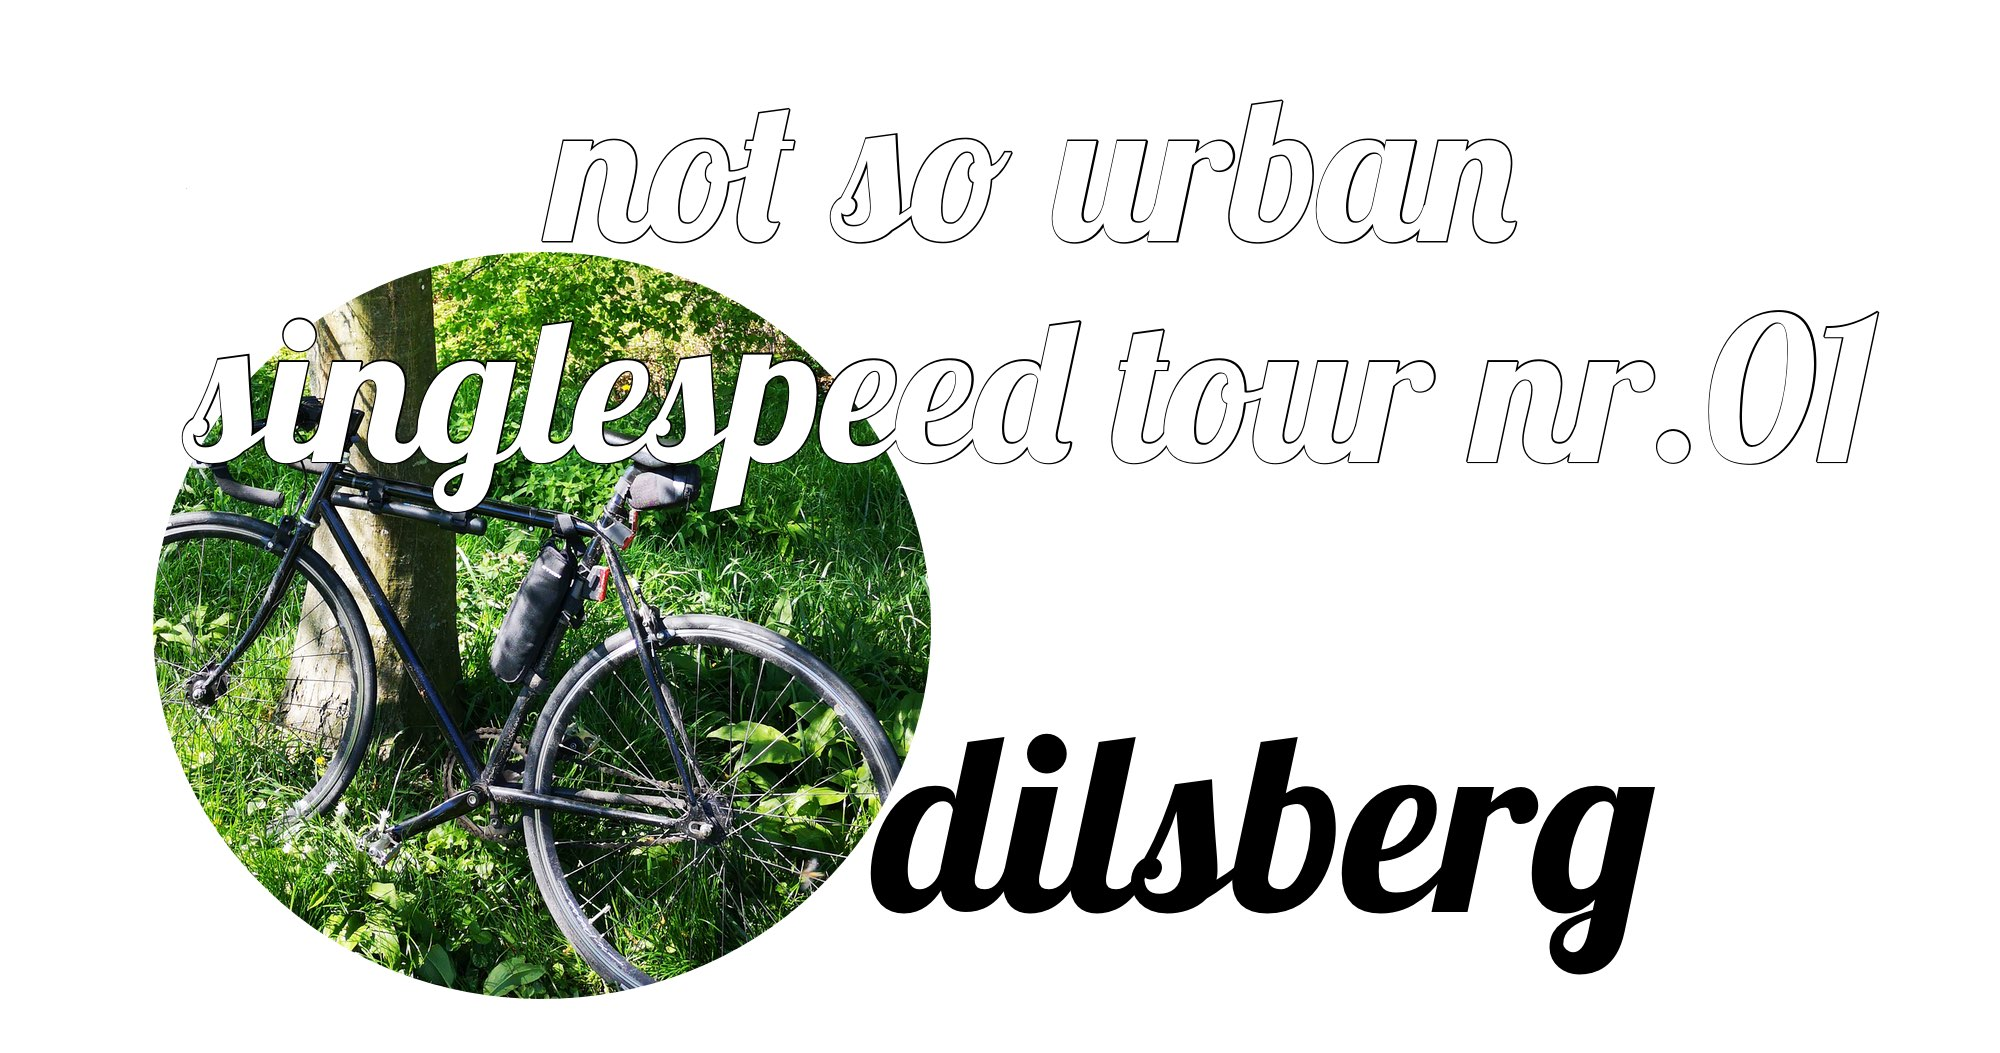 not so urban singlespeed tour nr.1 nach dilsberg (Verfasser: Andreas Allgeyer)